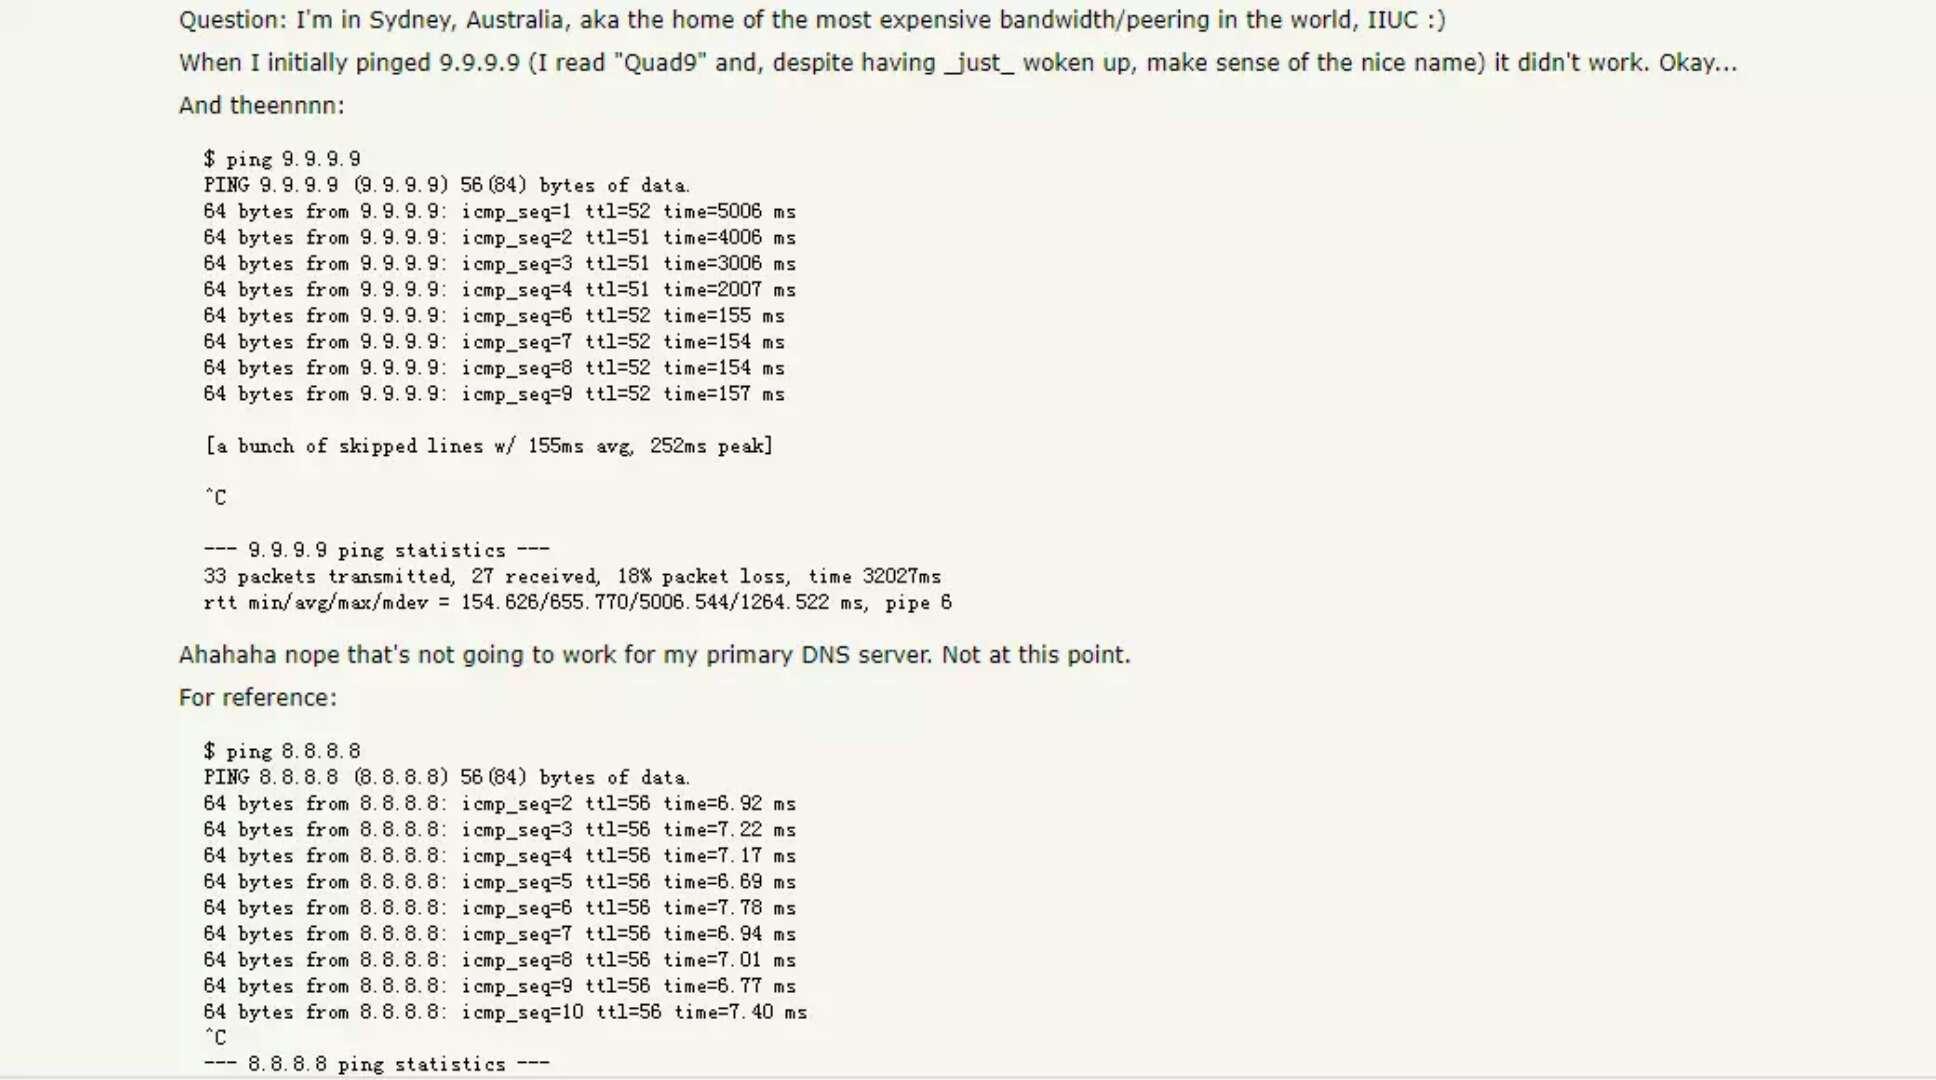 IBM 推出新 DNS 服务(9.9.9.9),谷歌(8.8.8.8)要哭了……-芊雅企服